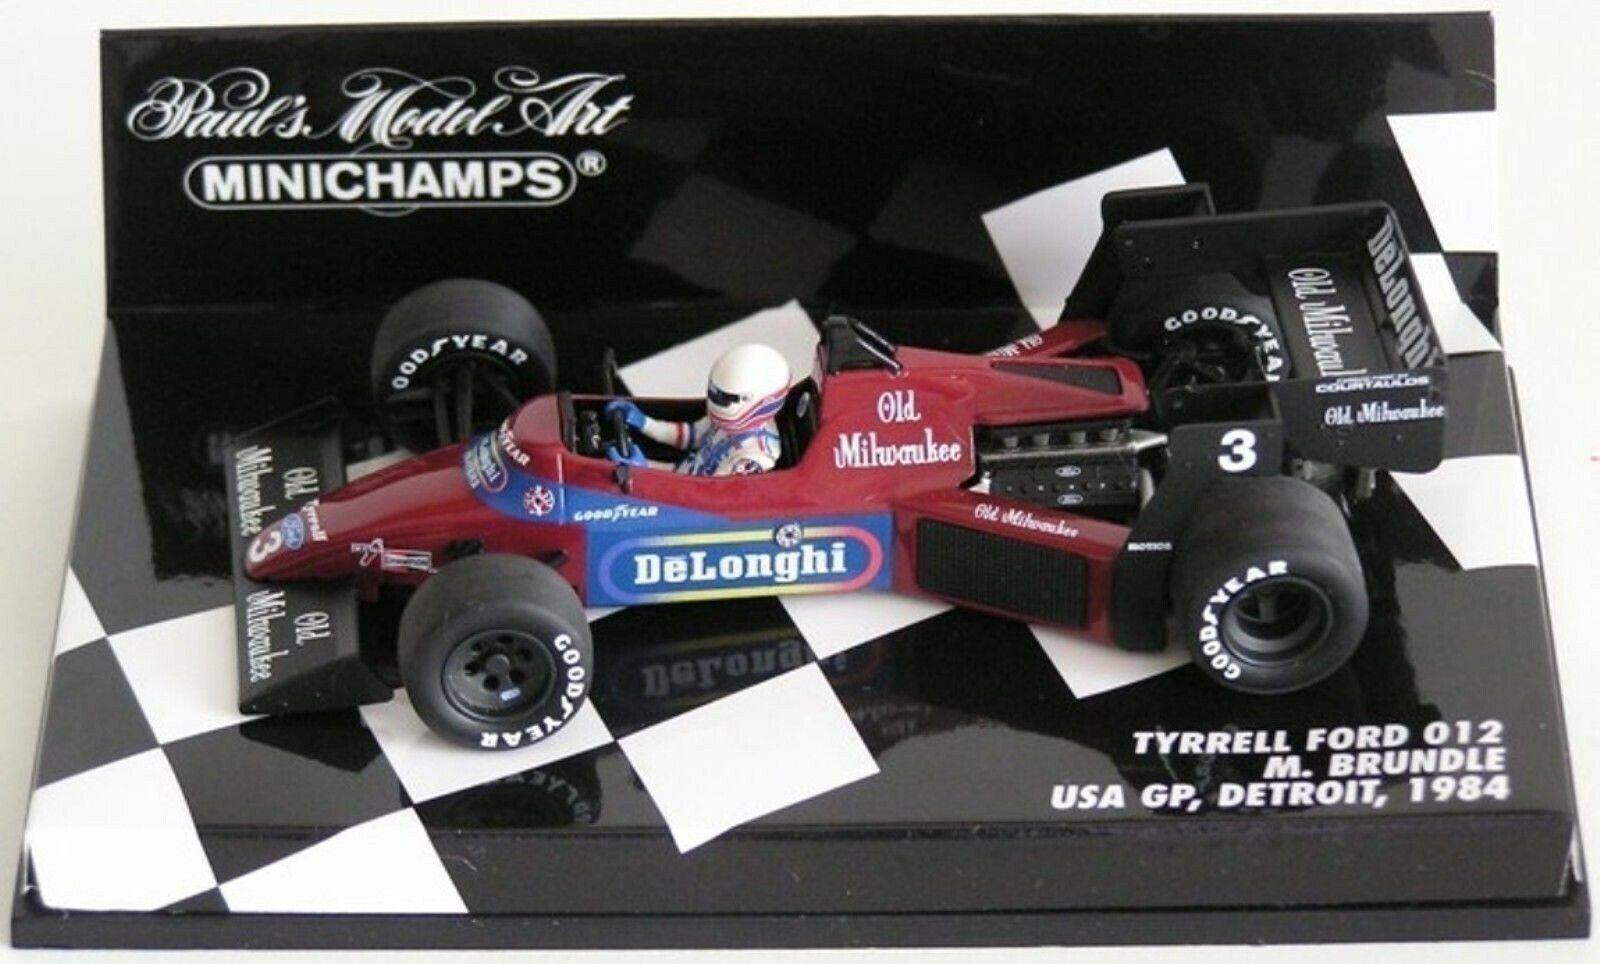 WOW estremamente raro TYRRELL 012 FORD BRUNDLE USA GP DETROIT 1984 1 43 Minichamps